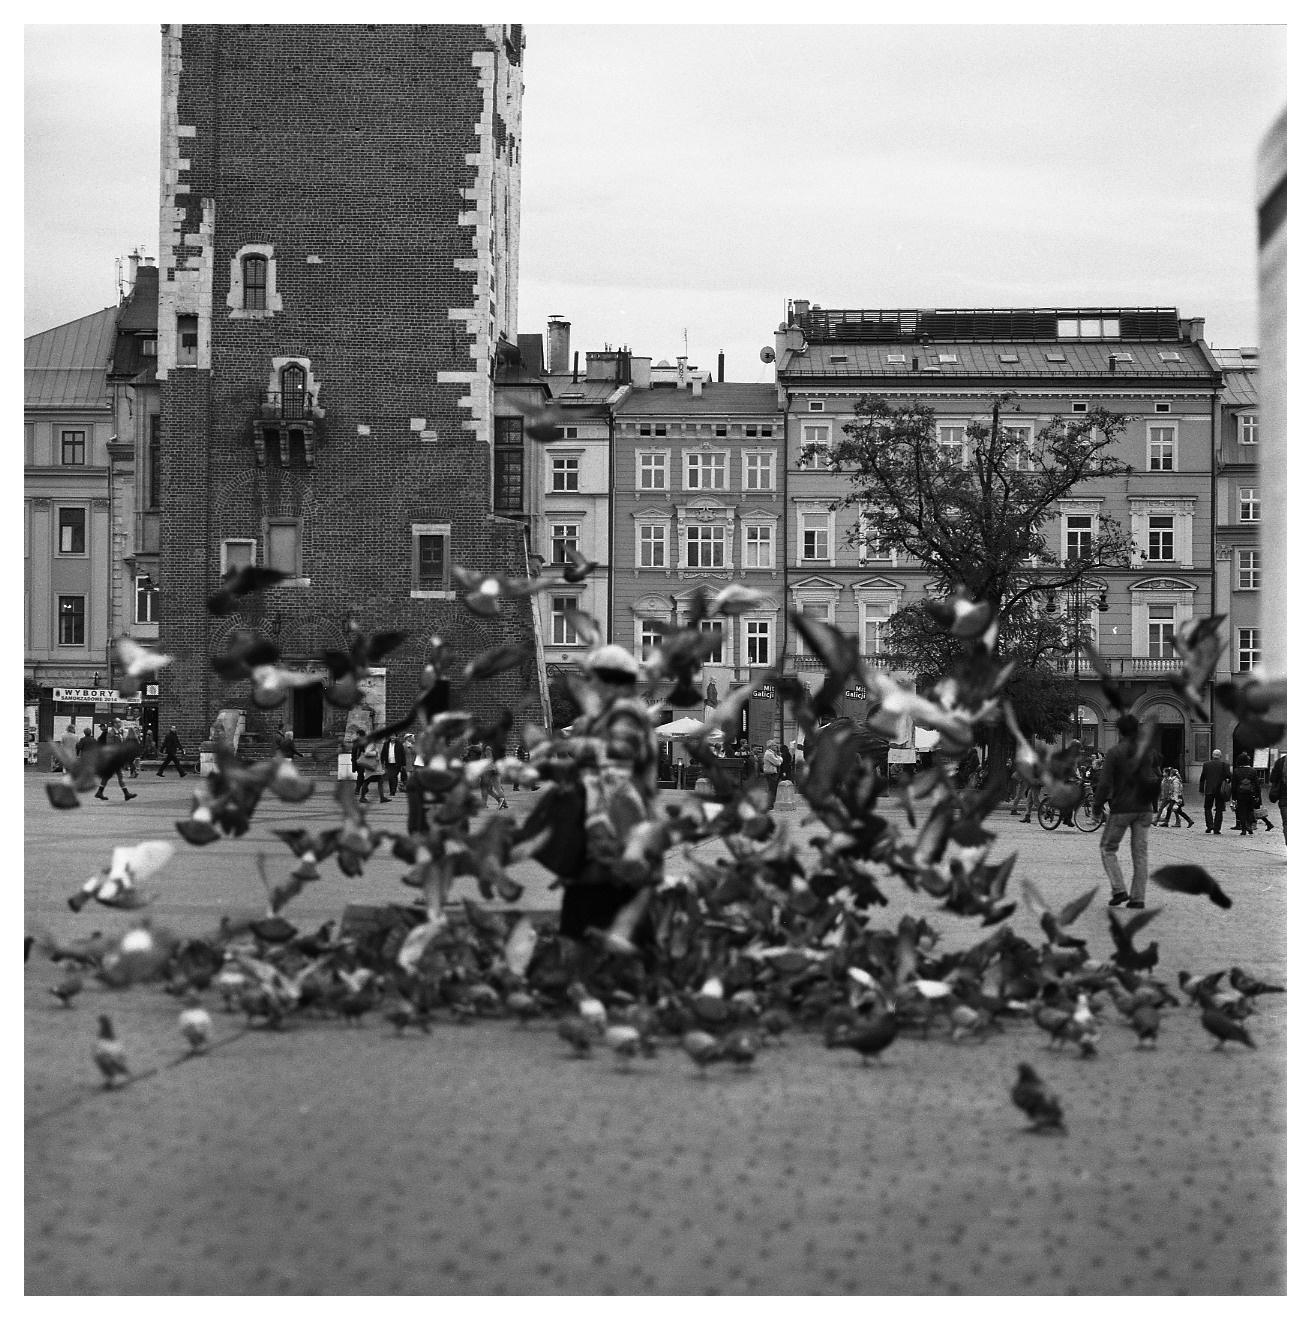 Hassel_BW_Kraków331.jpg